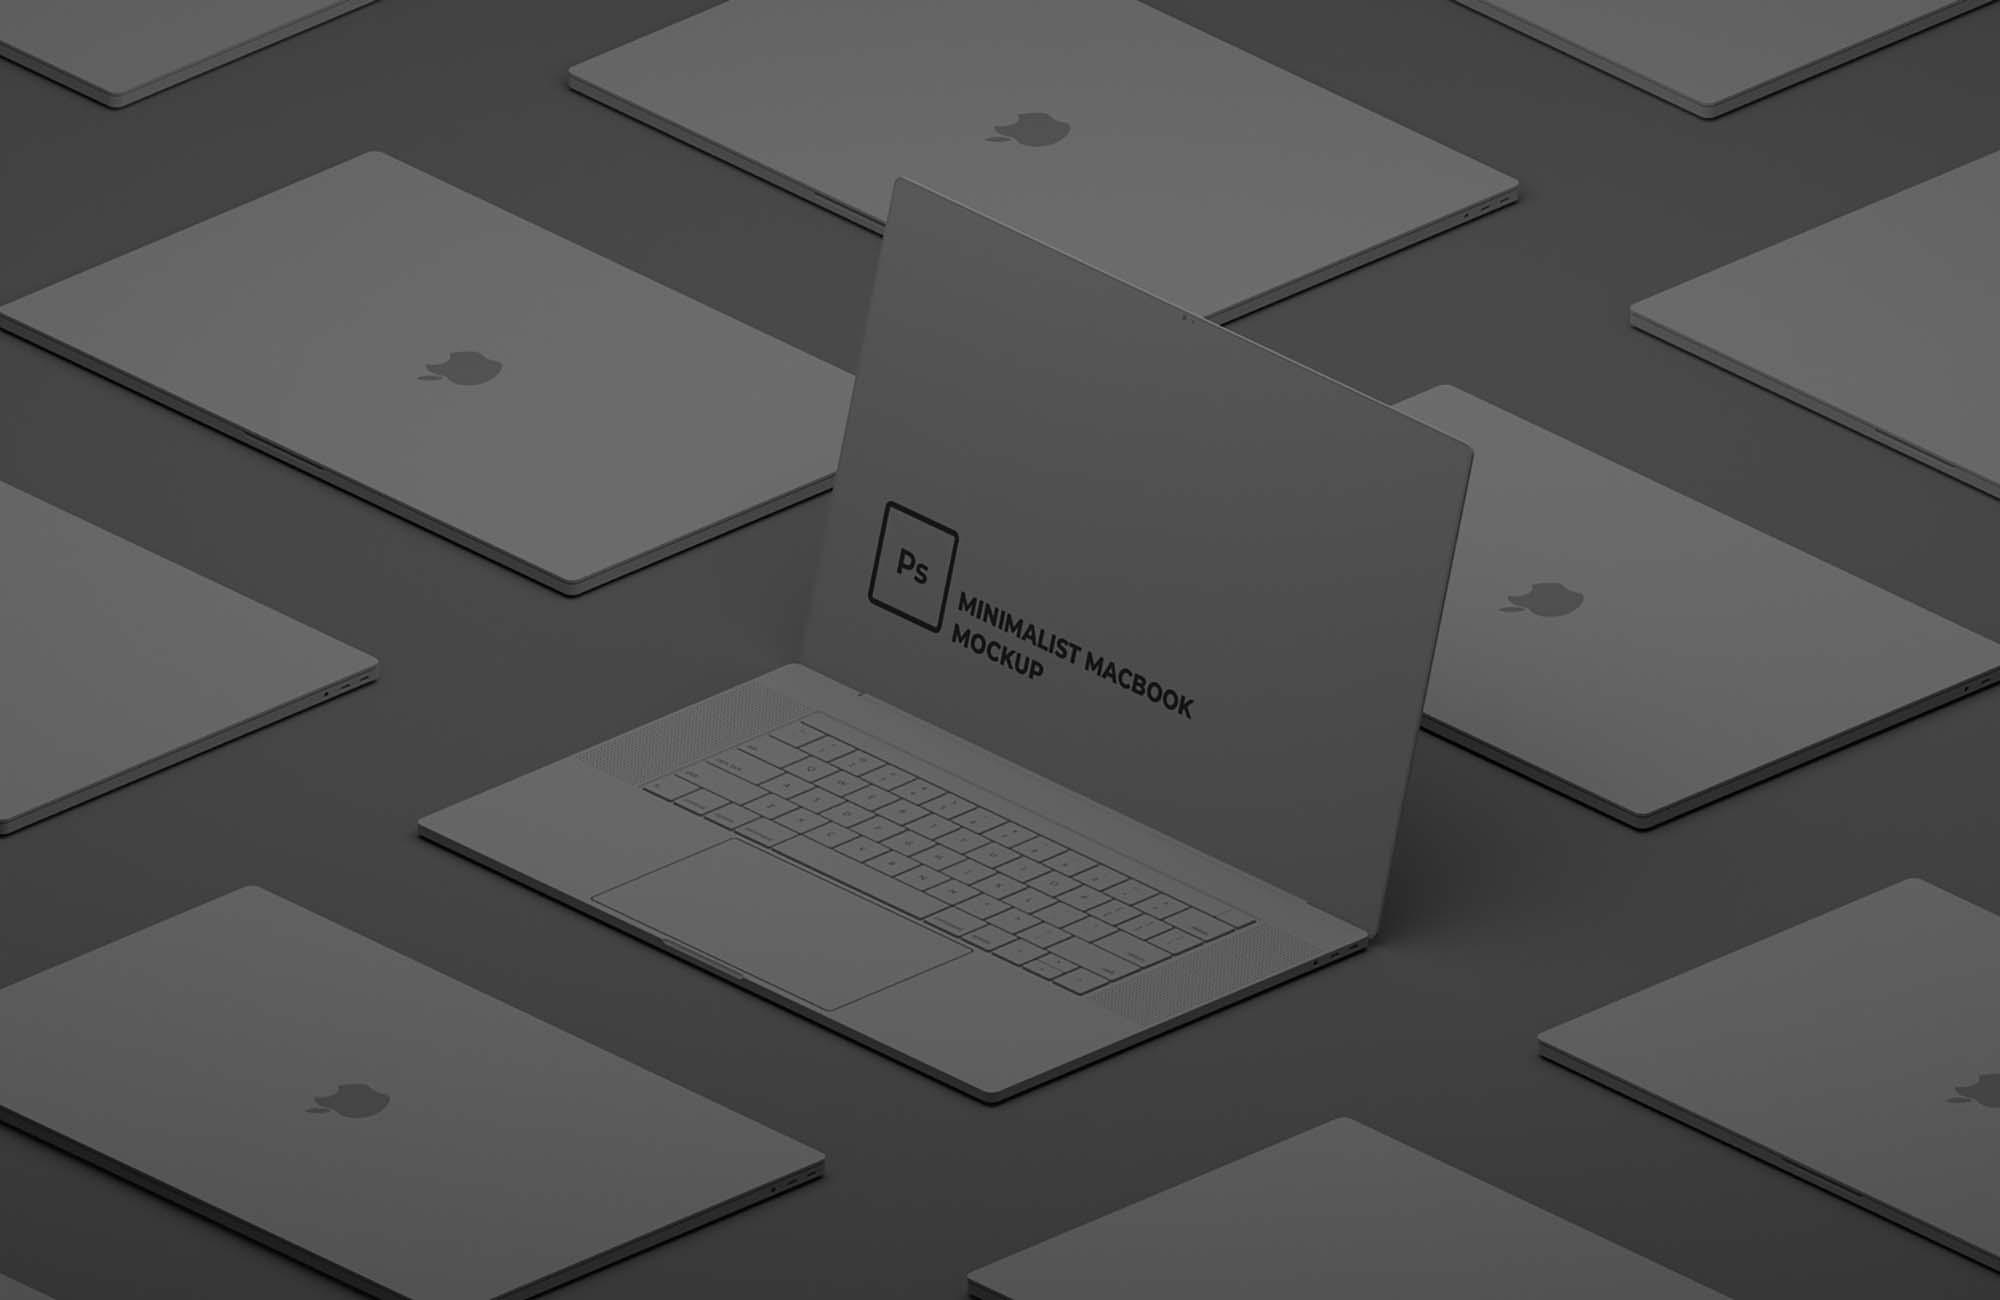 Minimalist Macbook Mockup 2